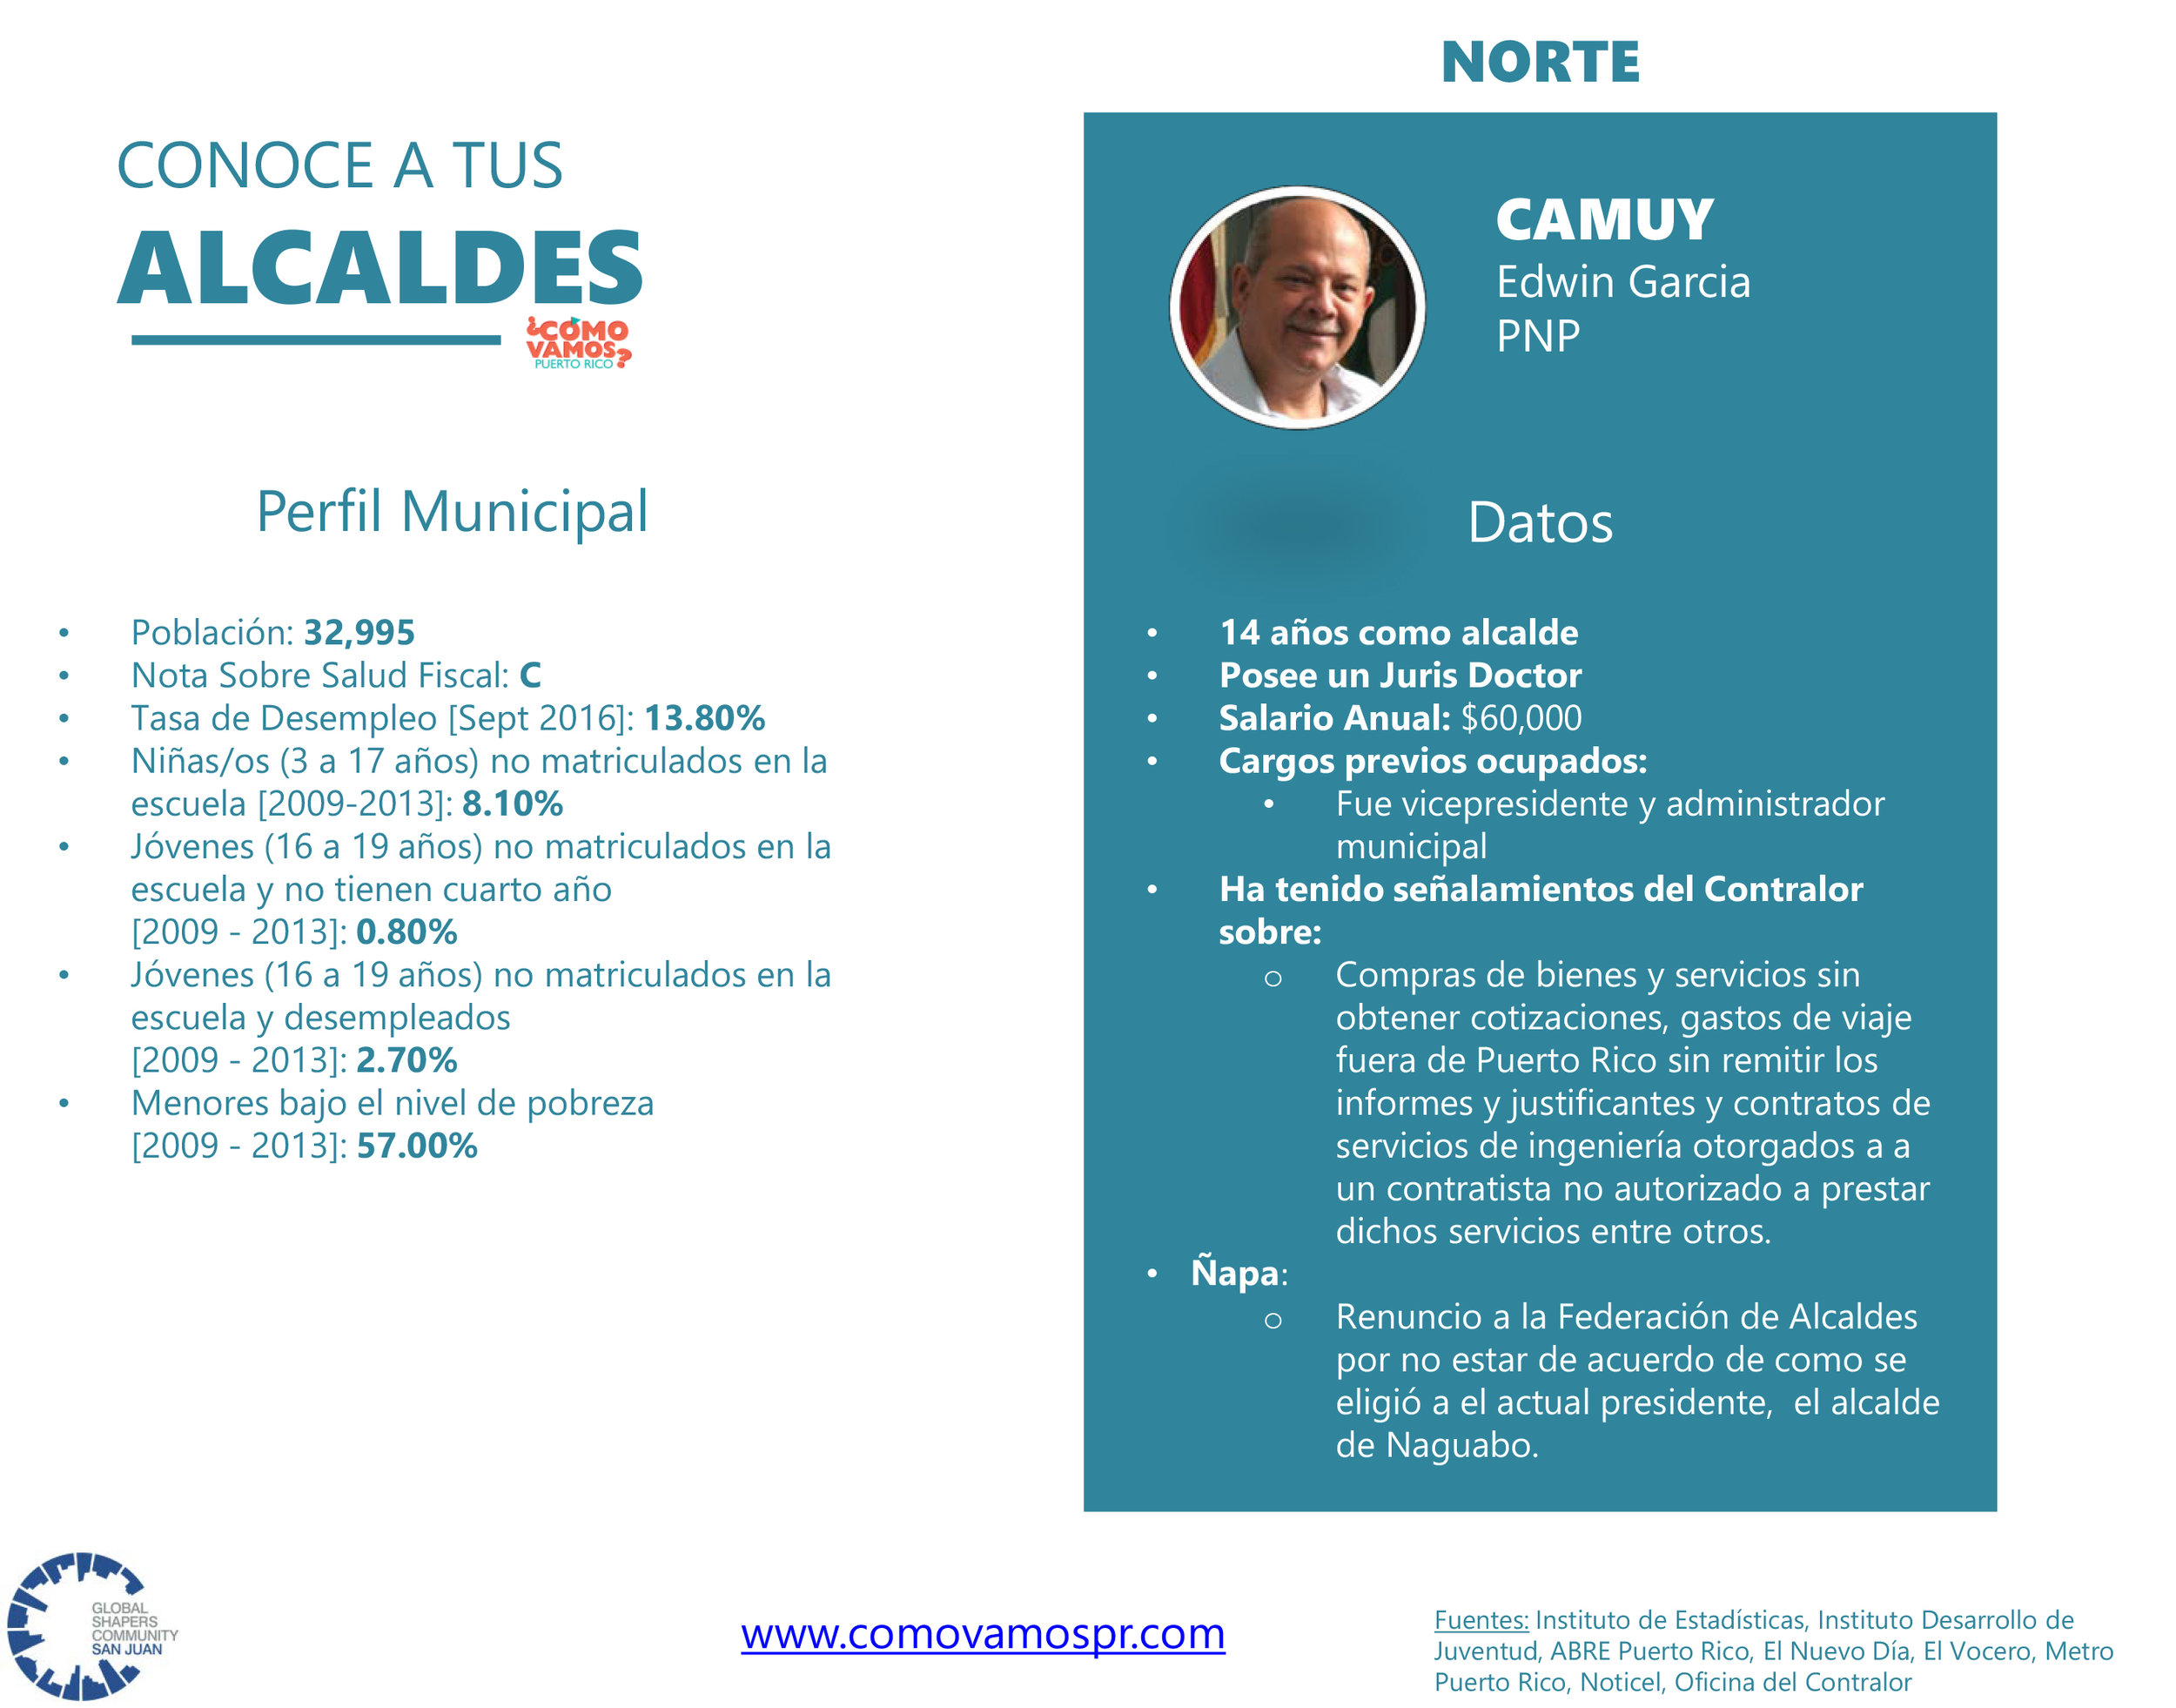 Alcaldes_Norte_Camuy.jpg